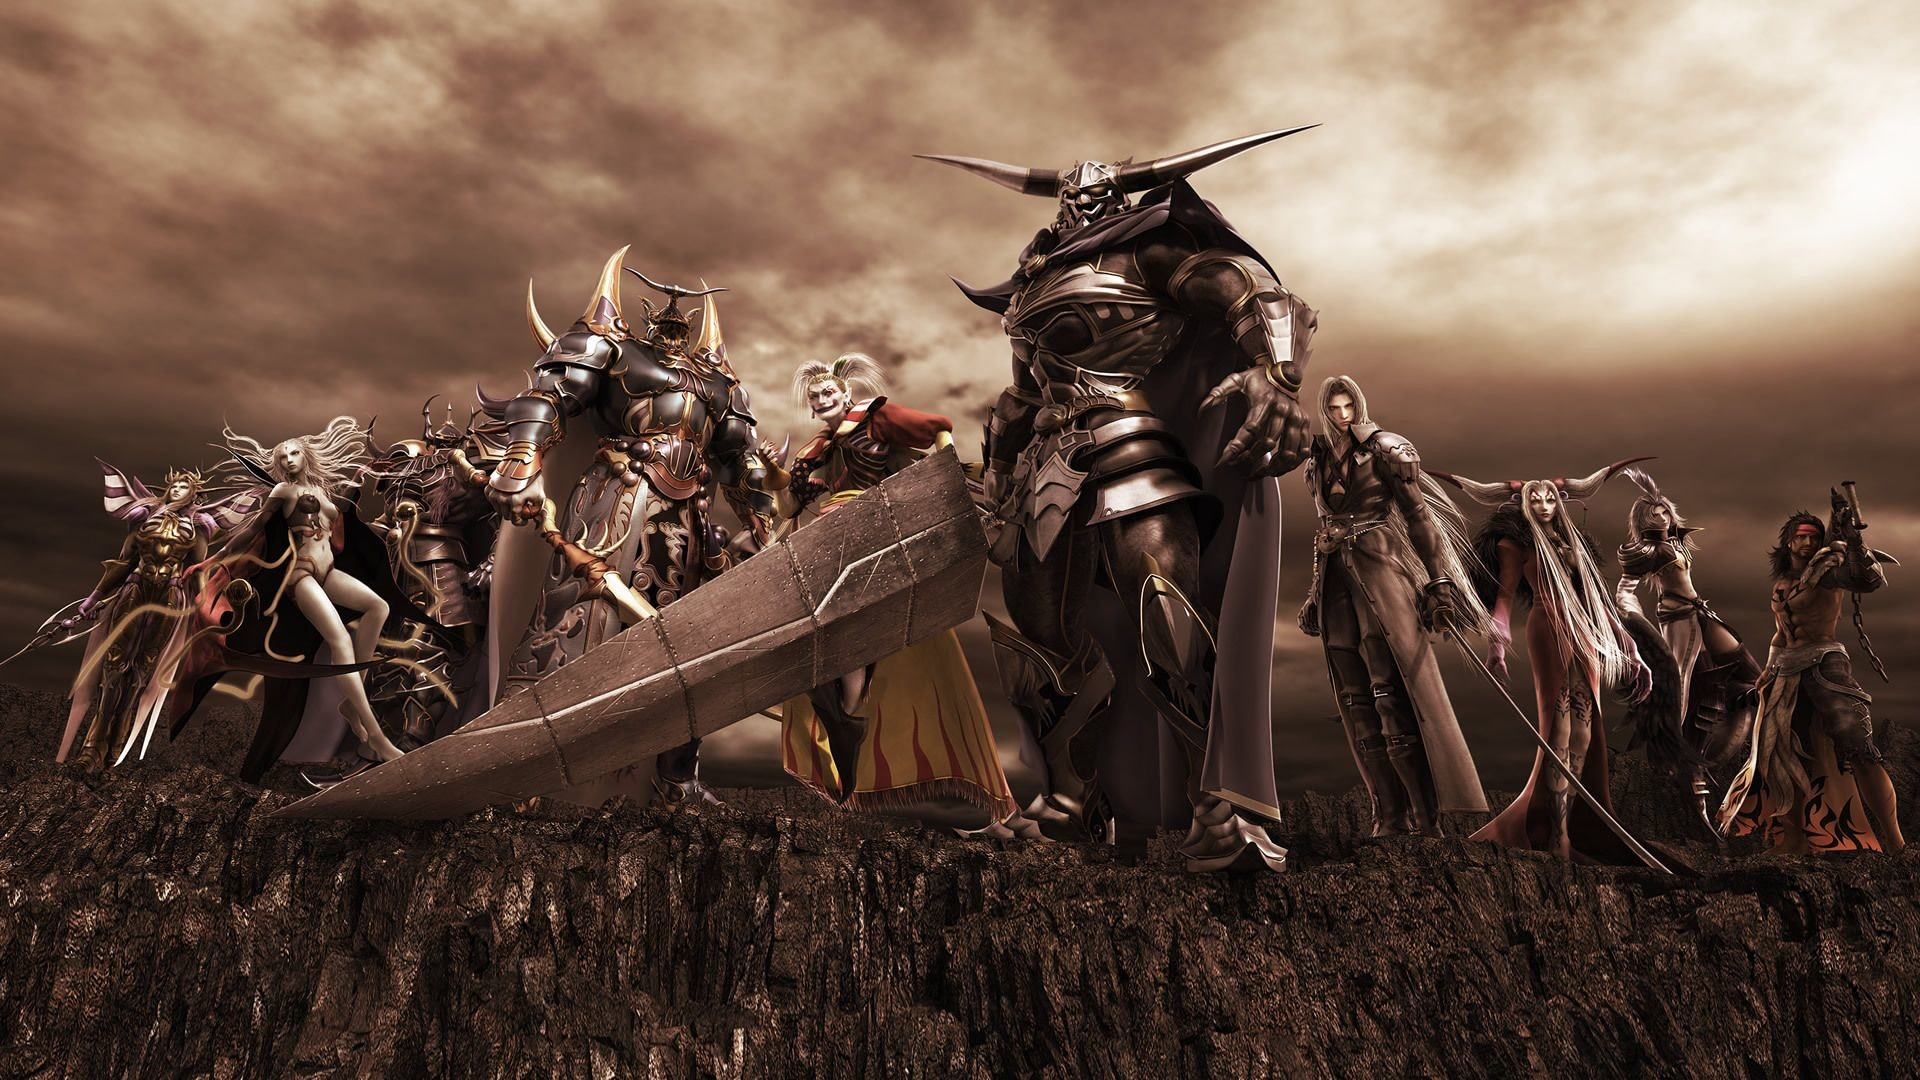 Res: 1920x1080, Riding Chocobo Final Fantasy XV Full HD / 1920×1080 Final Fantasy XV  Wallpapers (41 Wallpapers) | Adorable Wallpapers